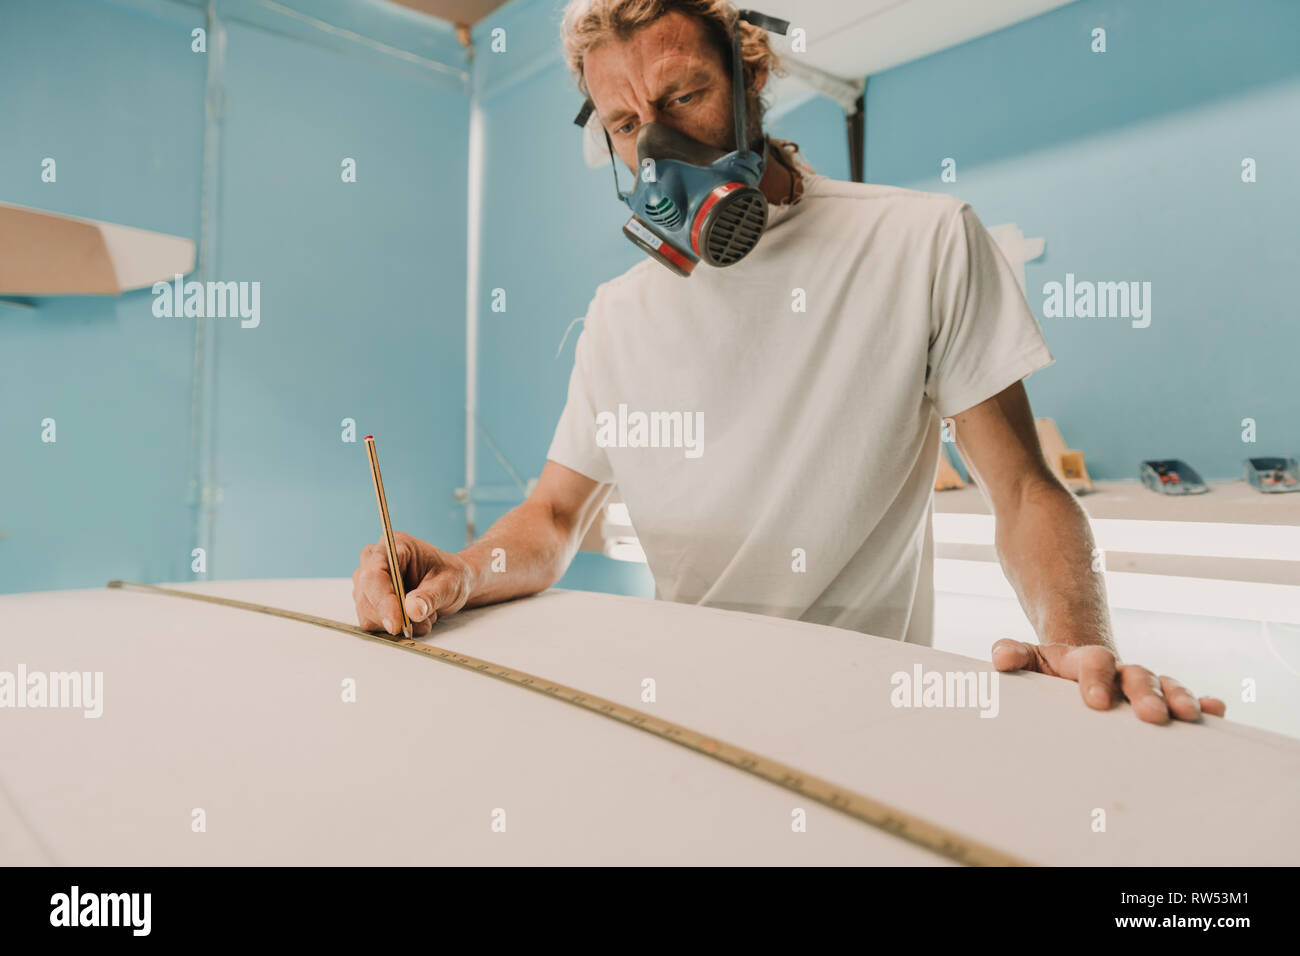 Man in respirator measuring surf board in workshop - Stock Image